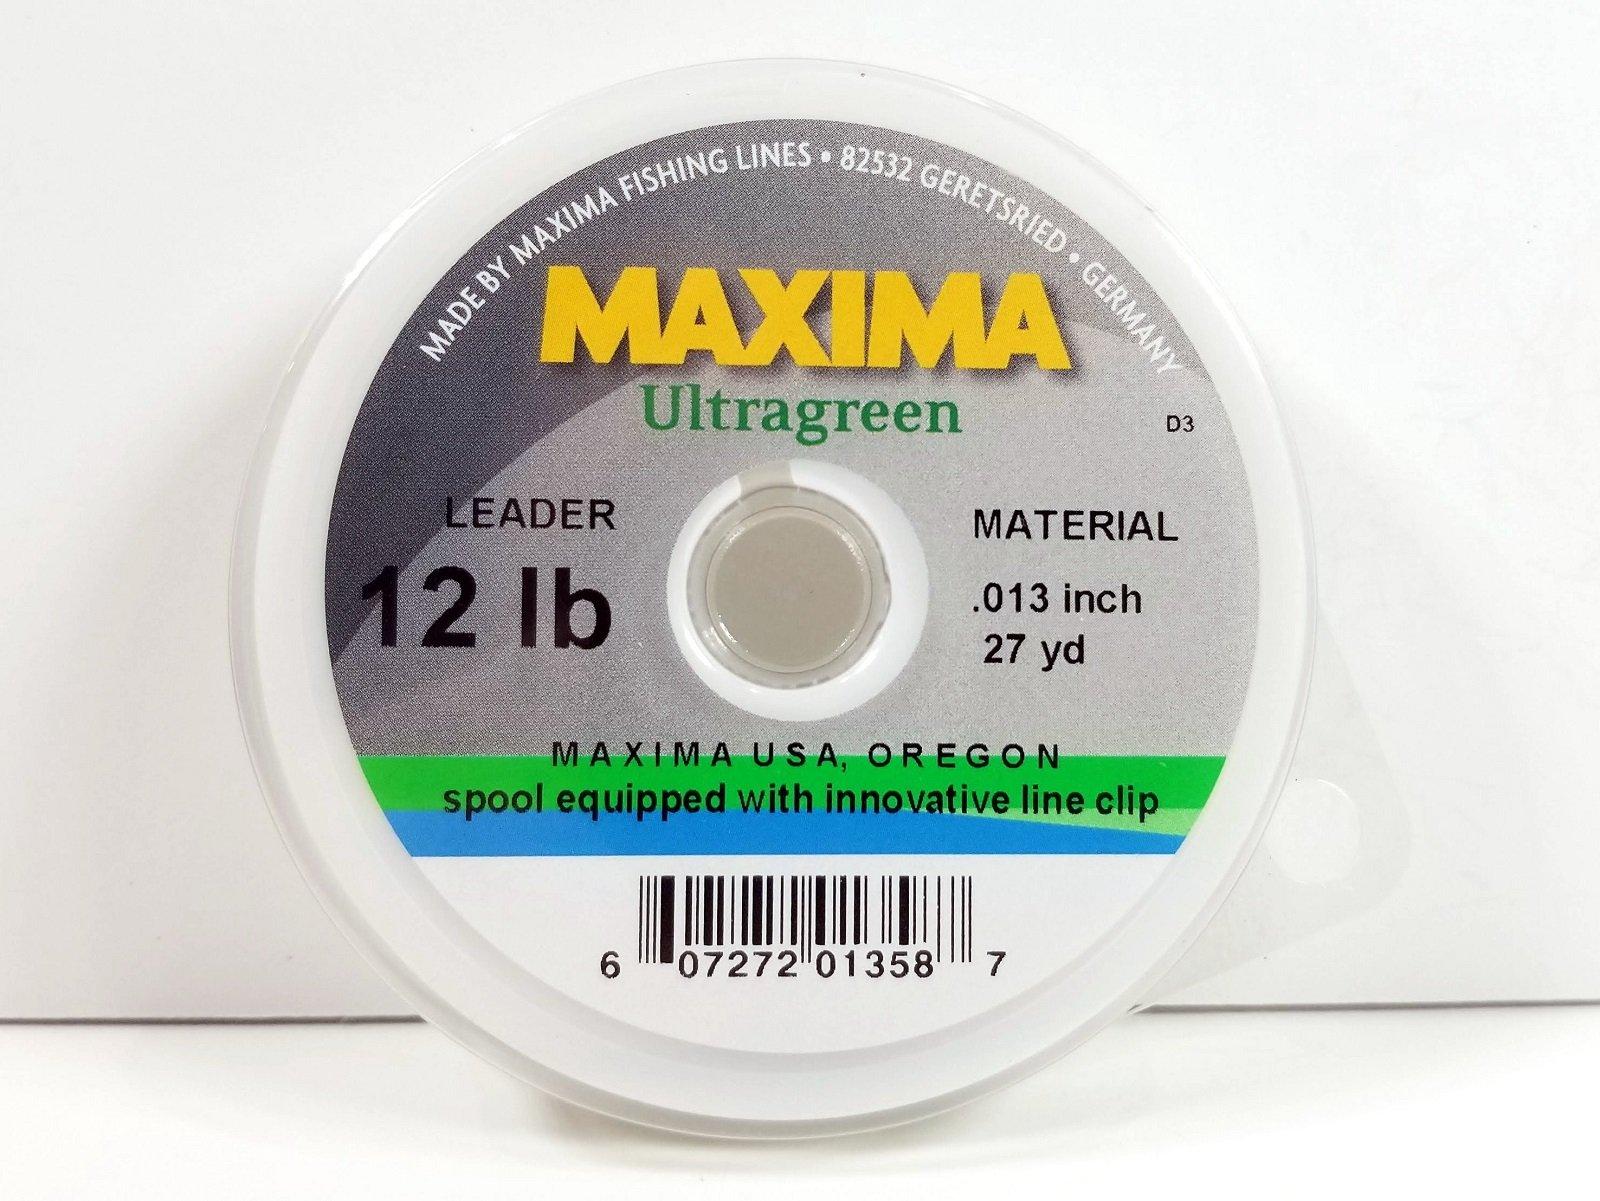 NEW MAXIMA ULTRAGREEN LEADER MATERIAL 40LB 17YD SPOOL fly fishing durable